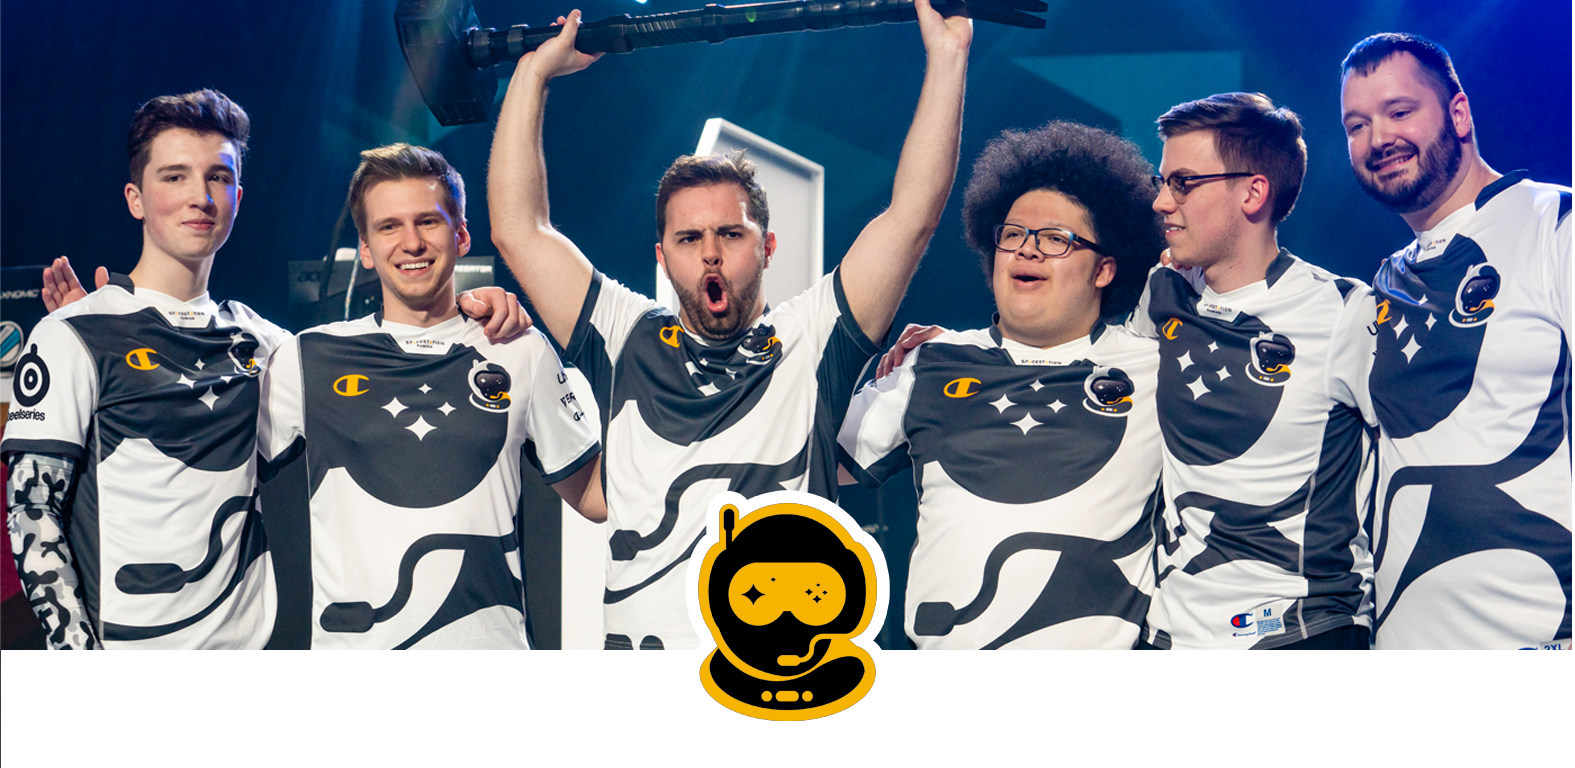 Team OG logo with them celebrating at a tournament